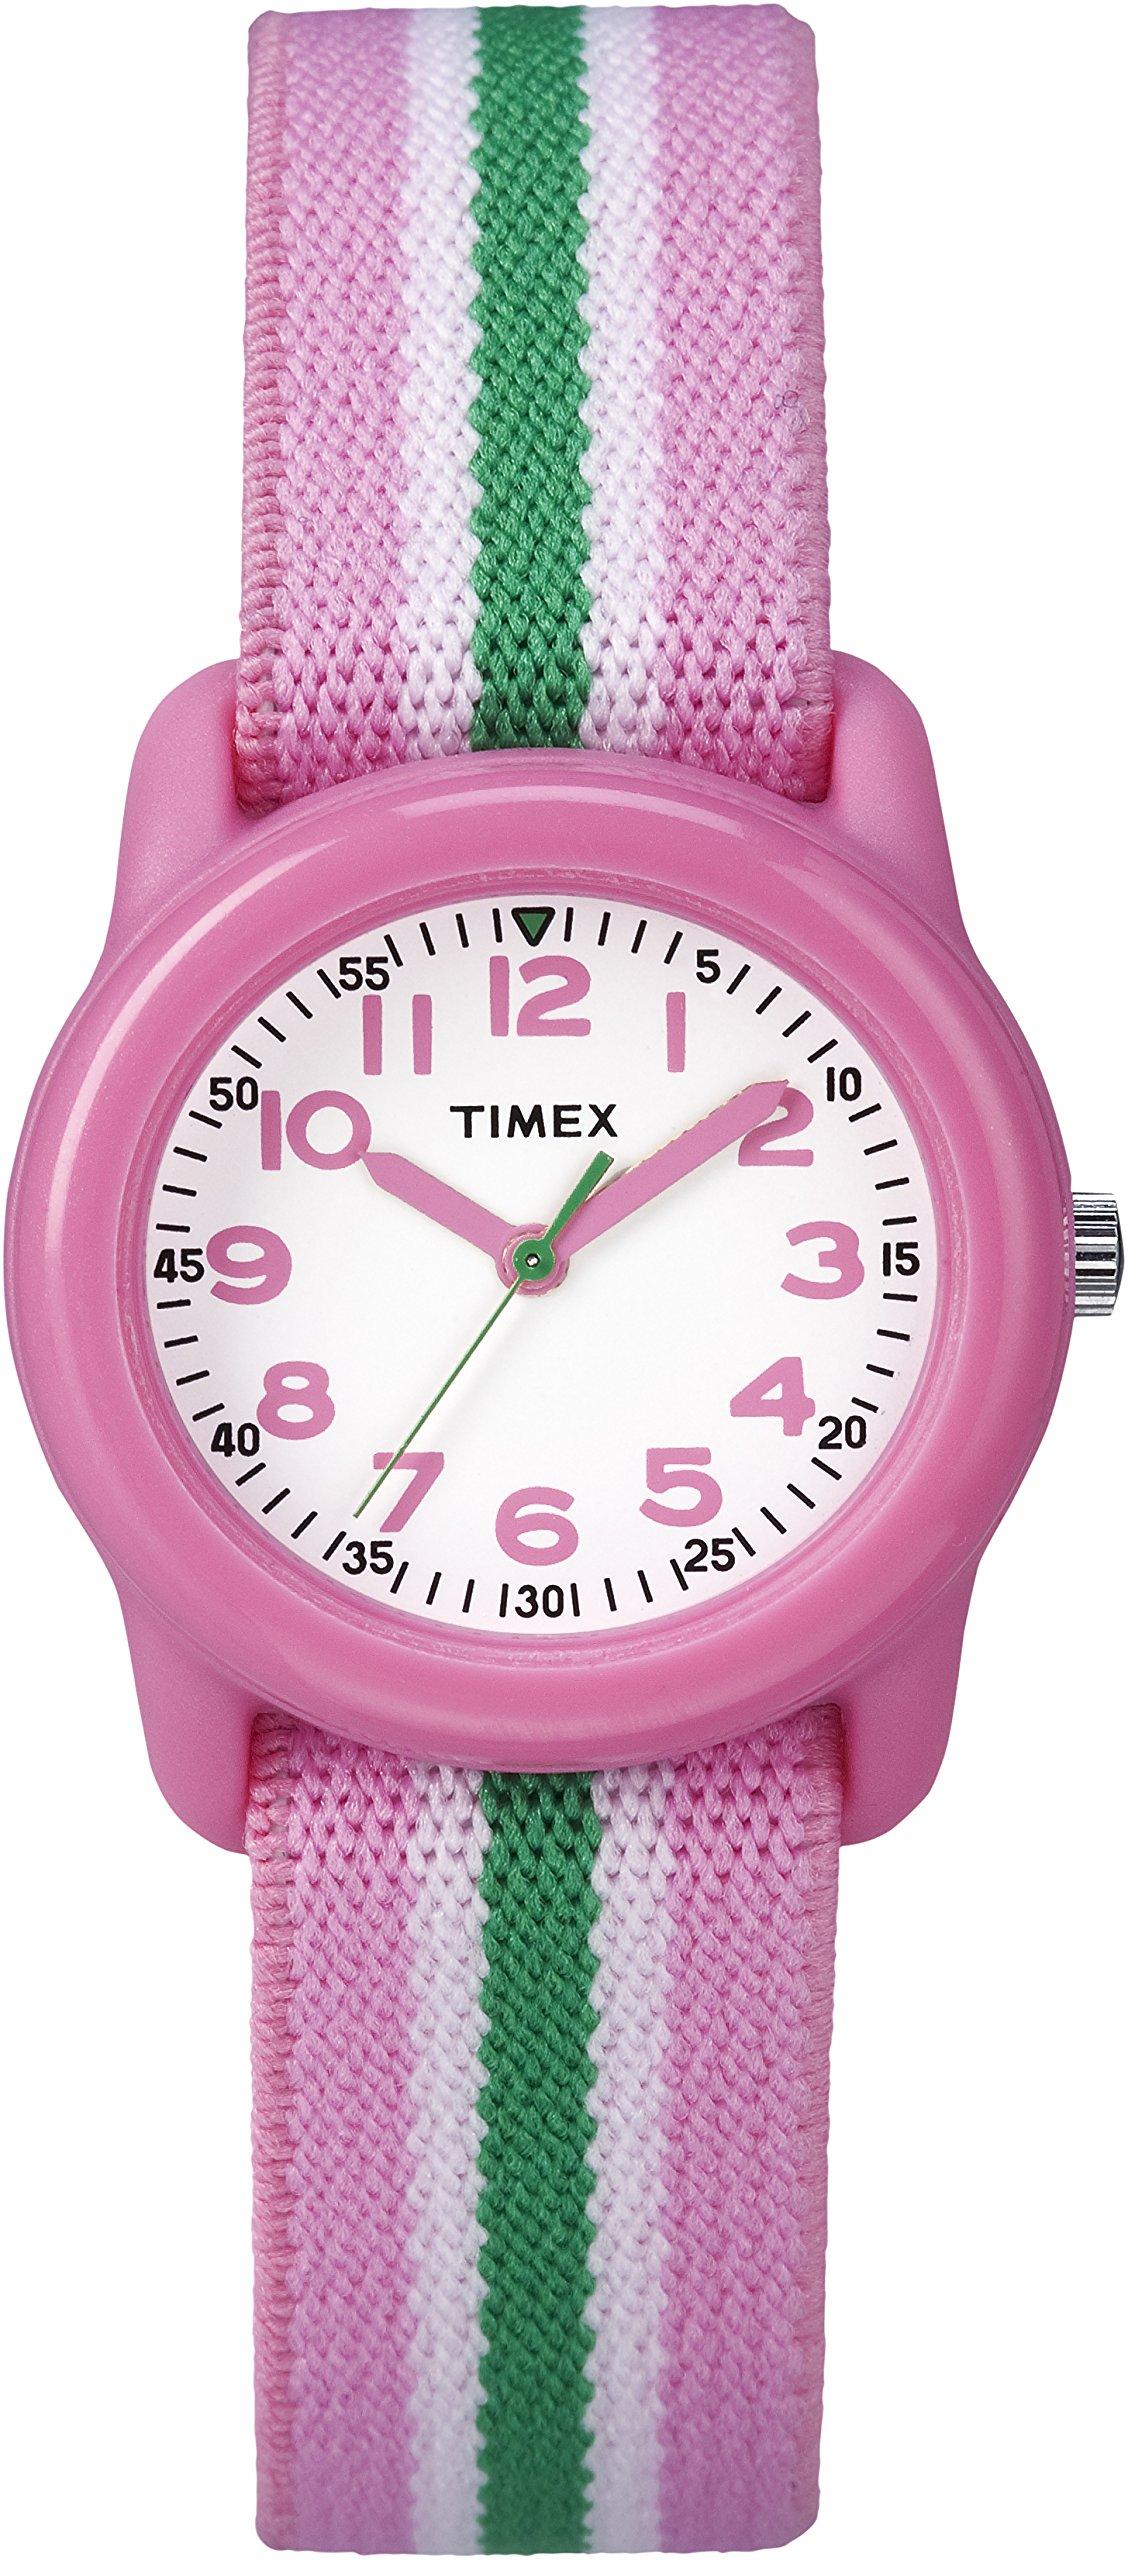 Timex Girls TW7C05900 Time Machines Analog Resin Pink/Green Stripes Elastic Fabric Strap Watch